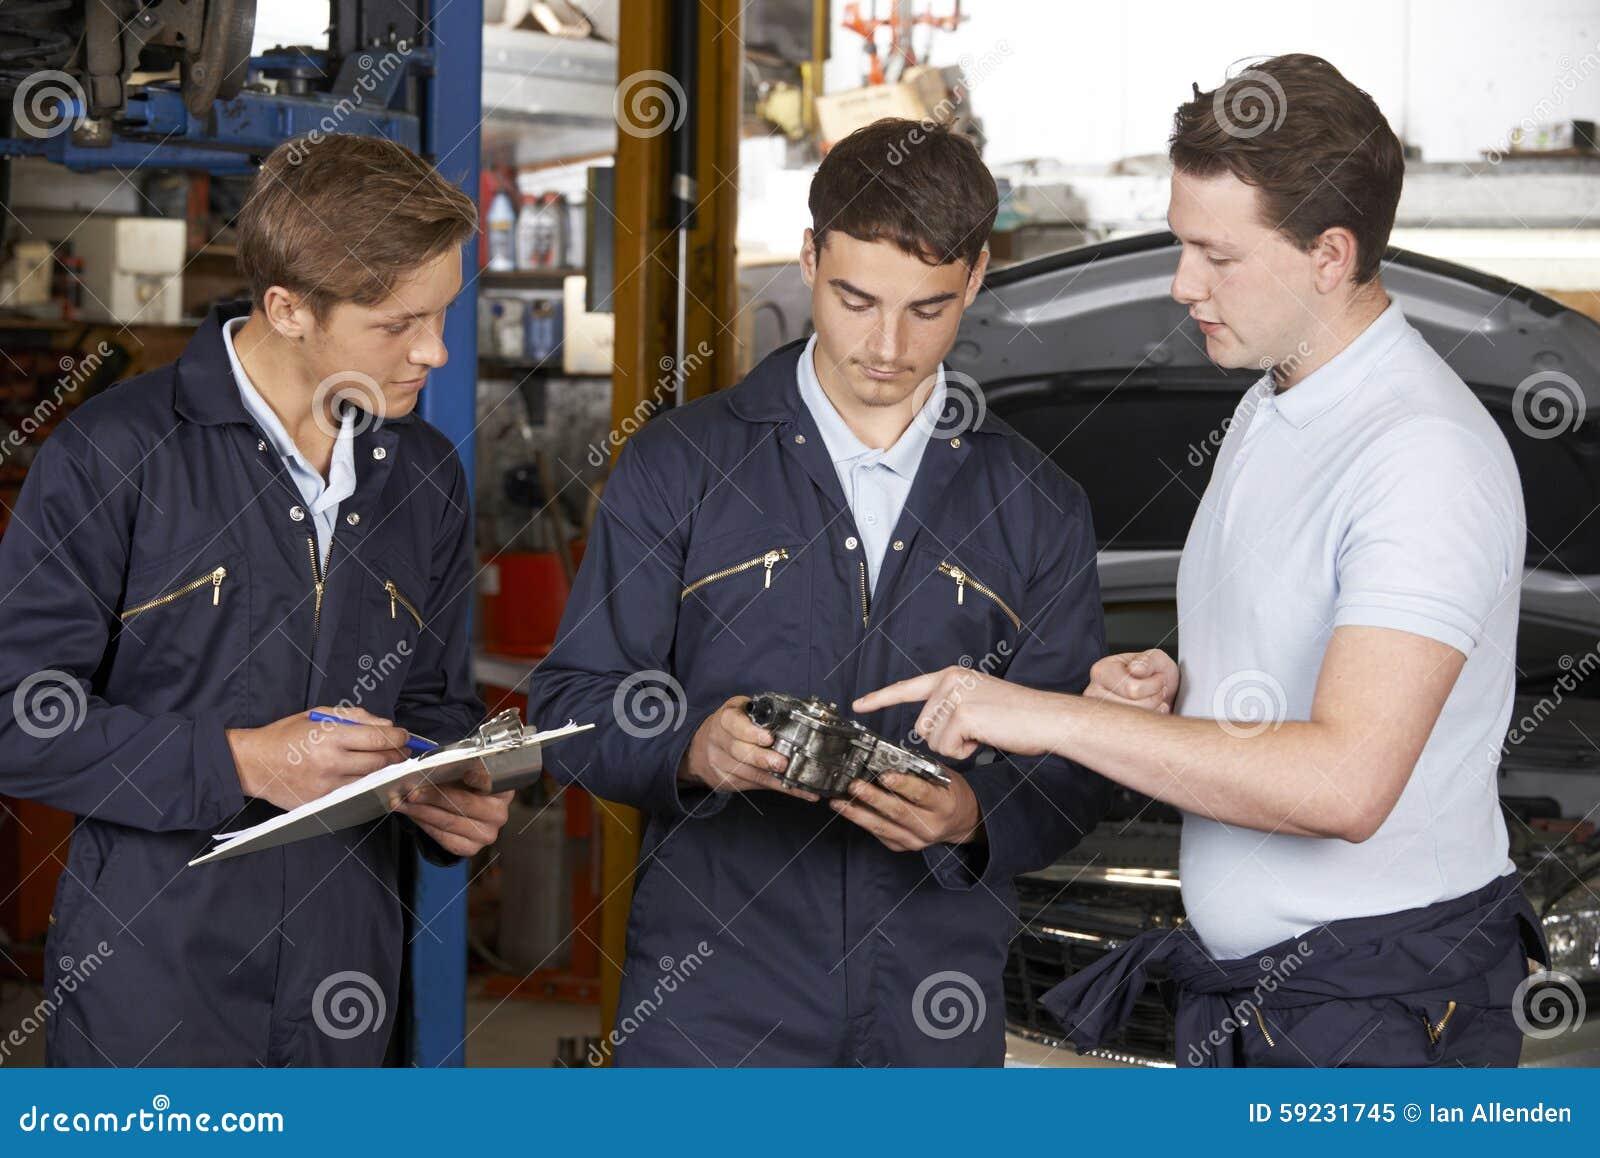 Download Taller Del Garaje De Teaching Trainees In Del Mecánico Imagen de archivo - Imagen de persona, aprendizaje: 59231745